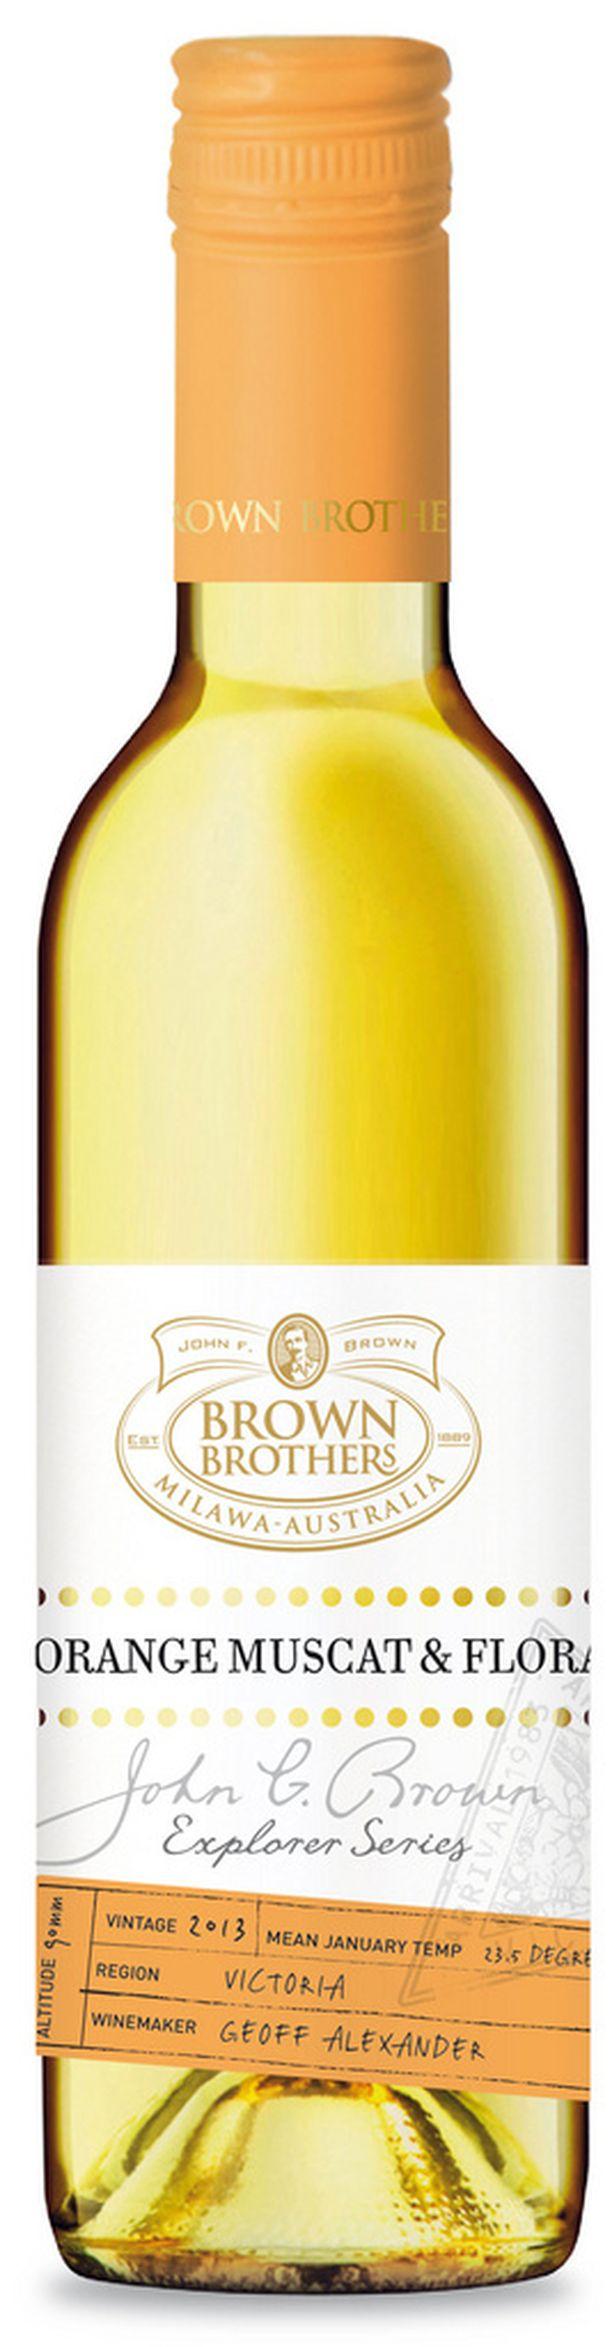 Brown Brother orange muscat & flora (37,5 cl), 13,49 euroa.